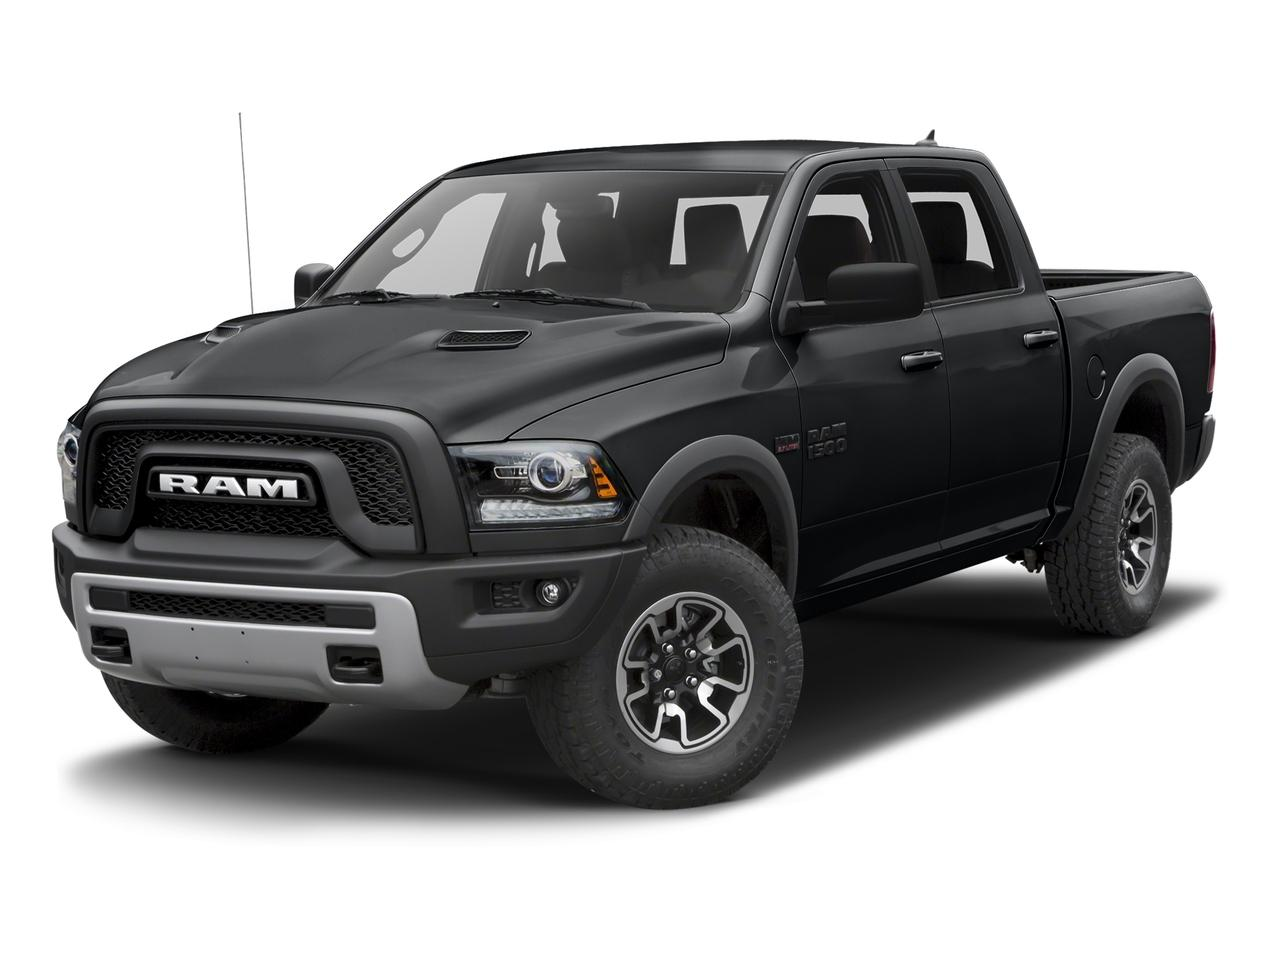 2017 Ram 1500 Vehicle Photo in King George, VA 22485